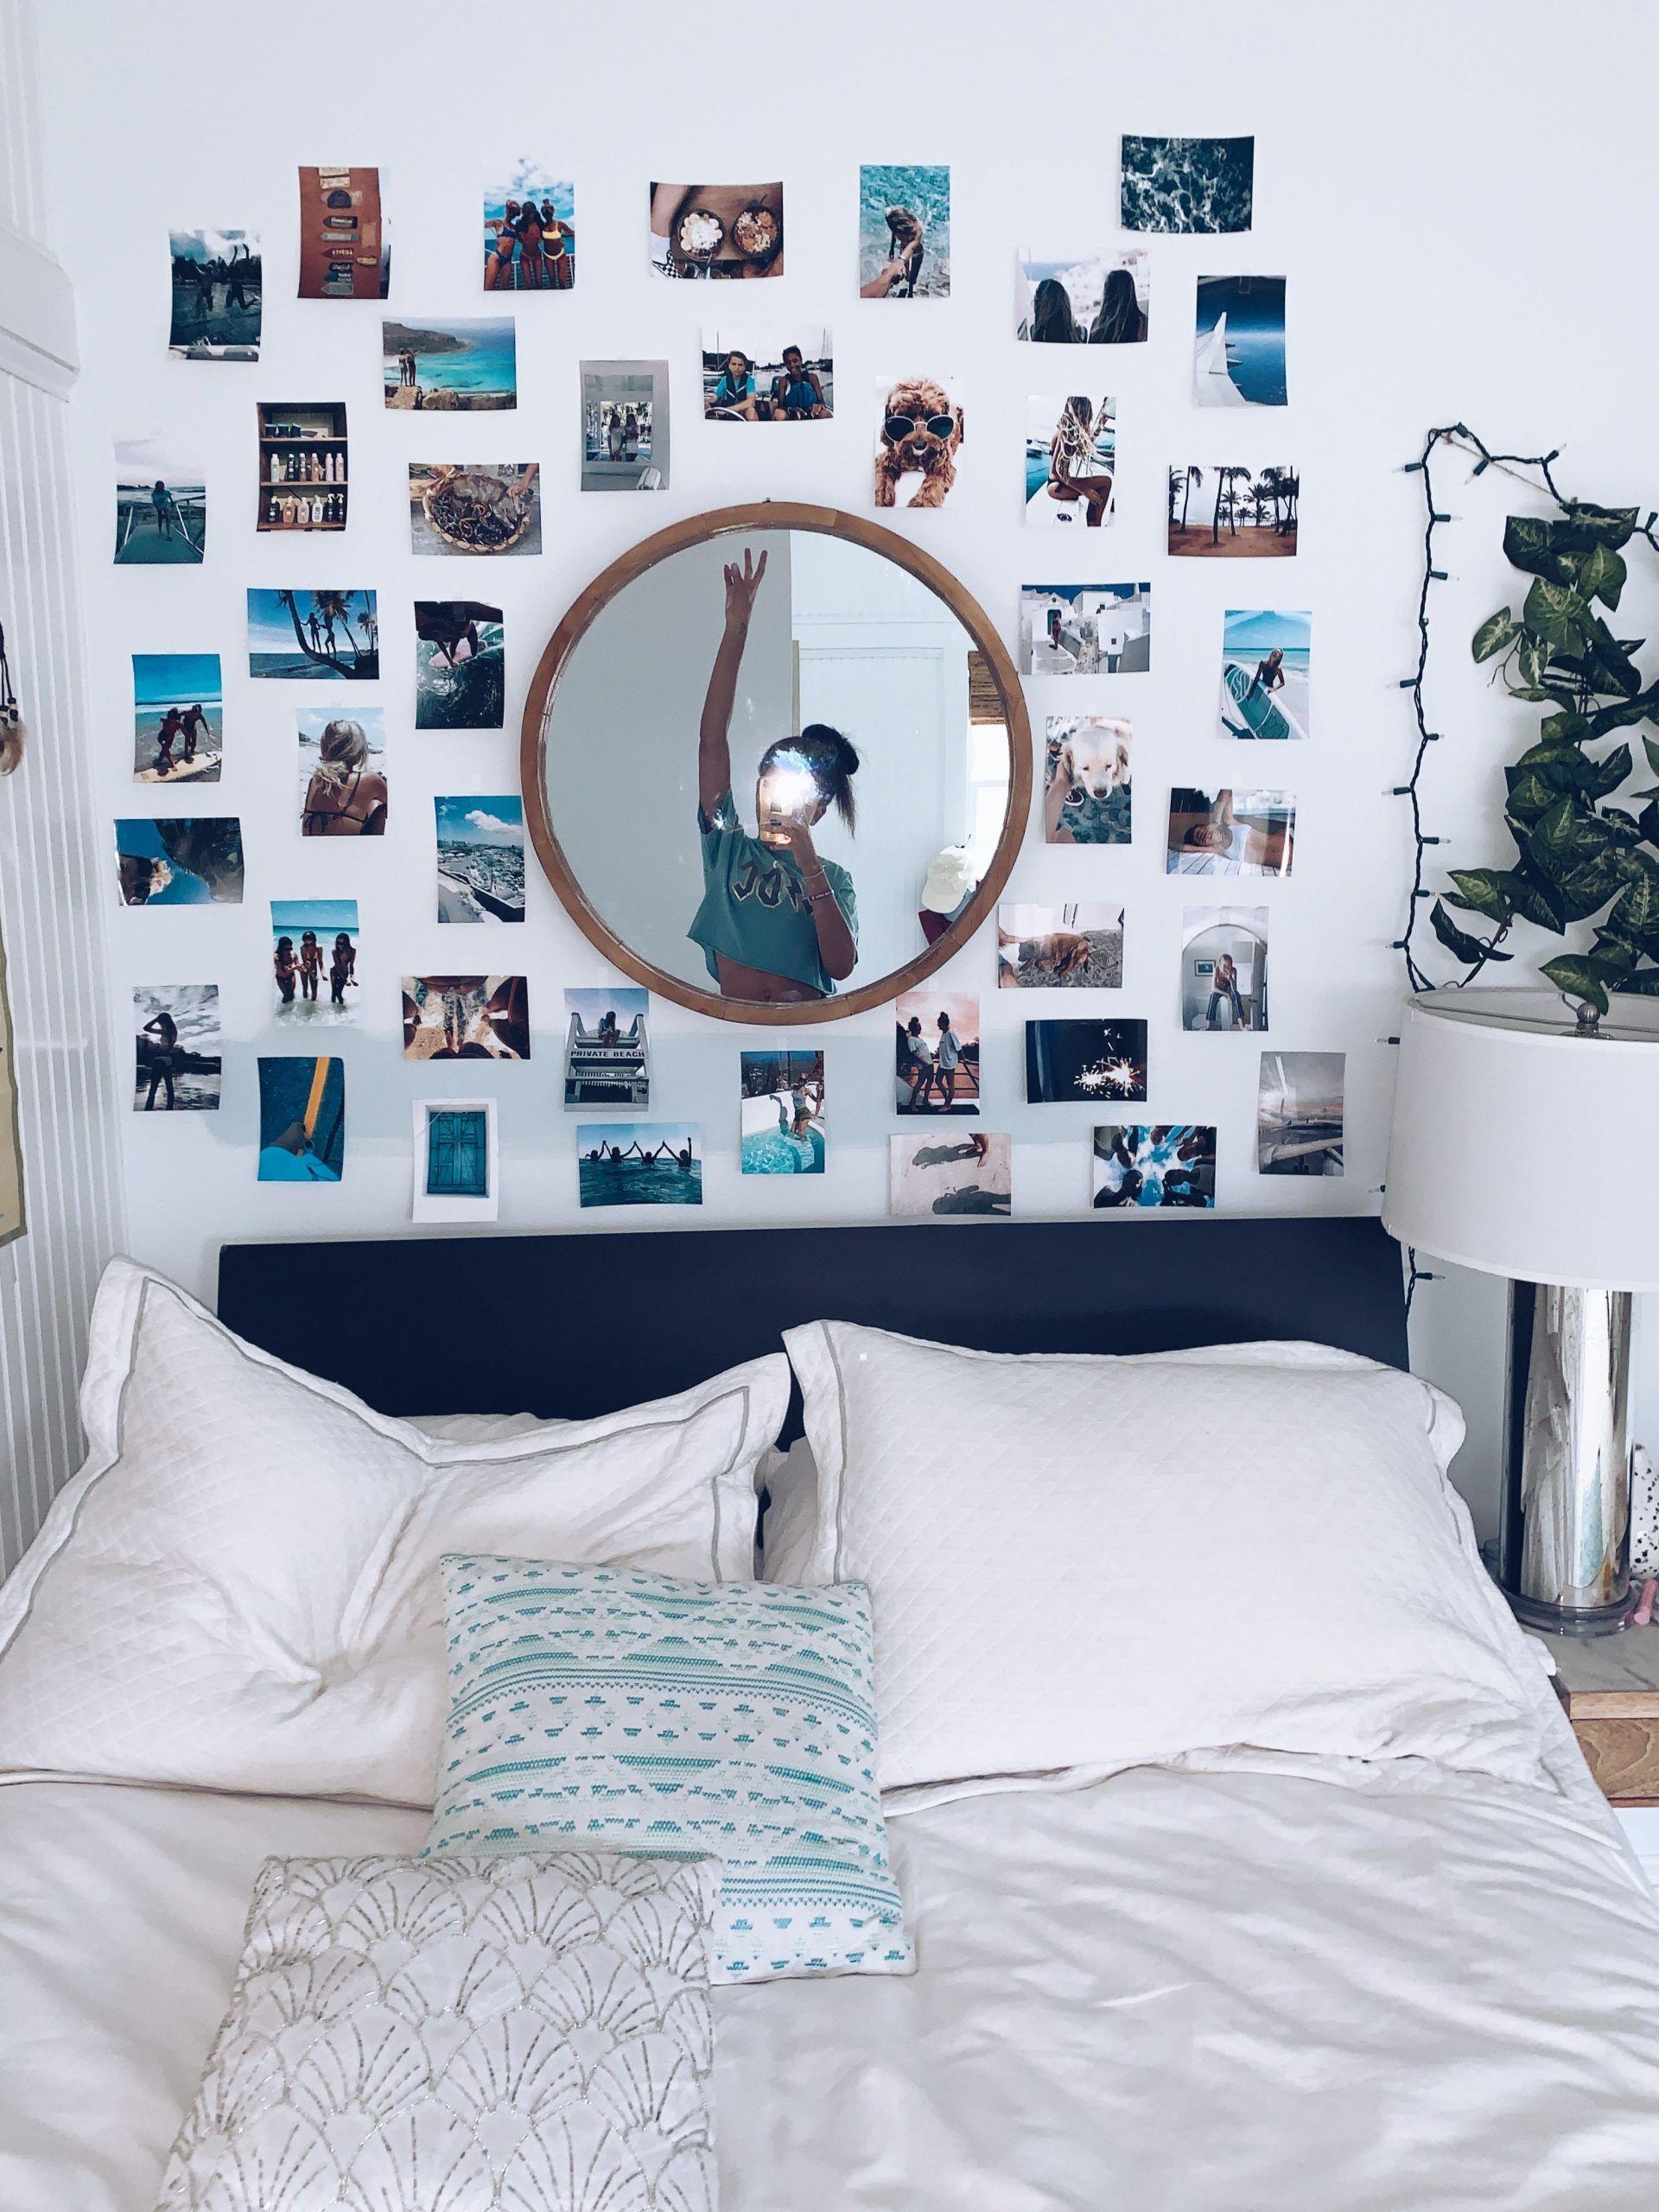 Pinterest Loveglo3 Loveglo3 Pinterest Dorm Room Decor Photo Walls Bedroom Redecorate Bedroom